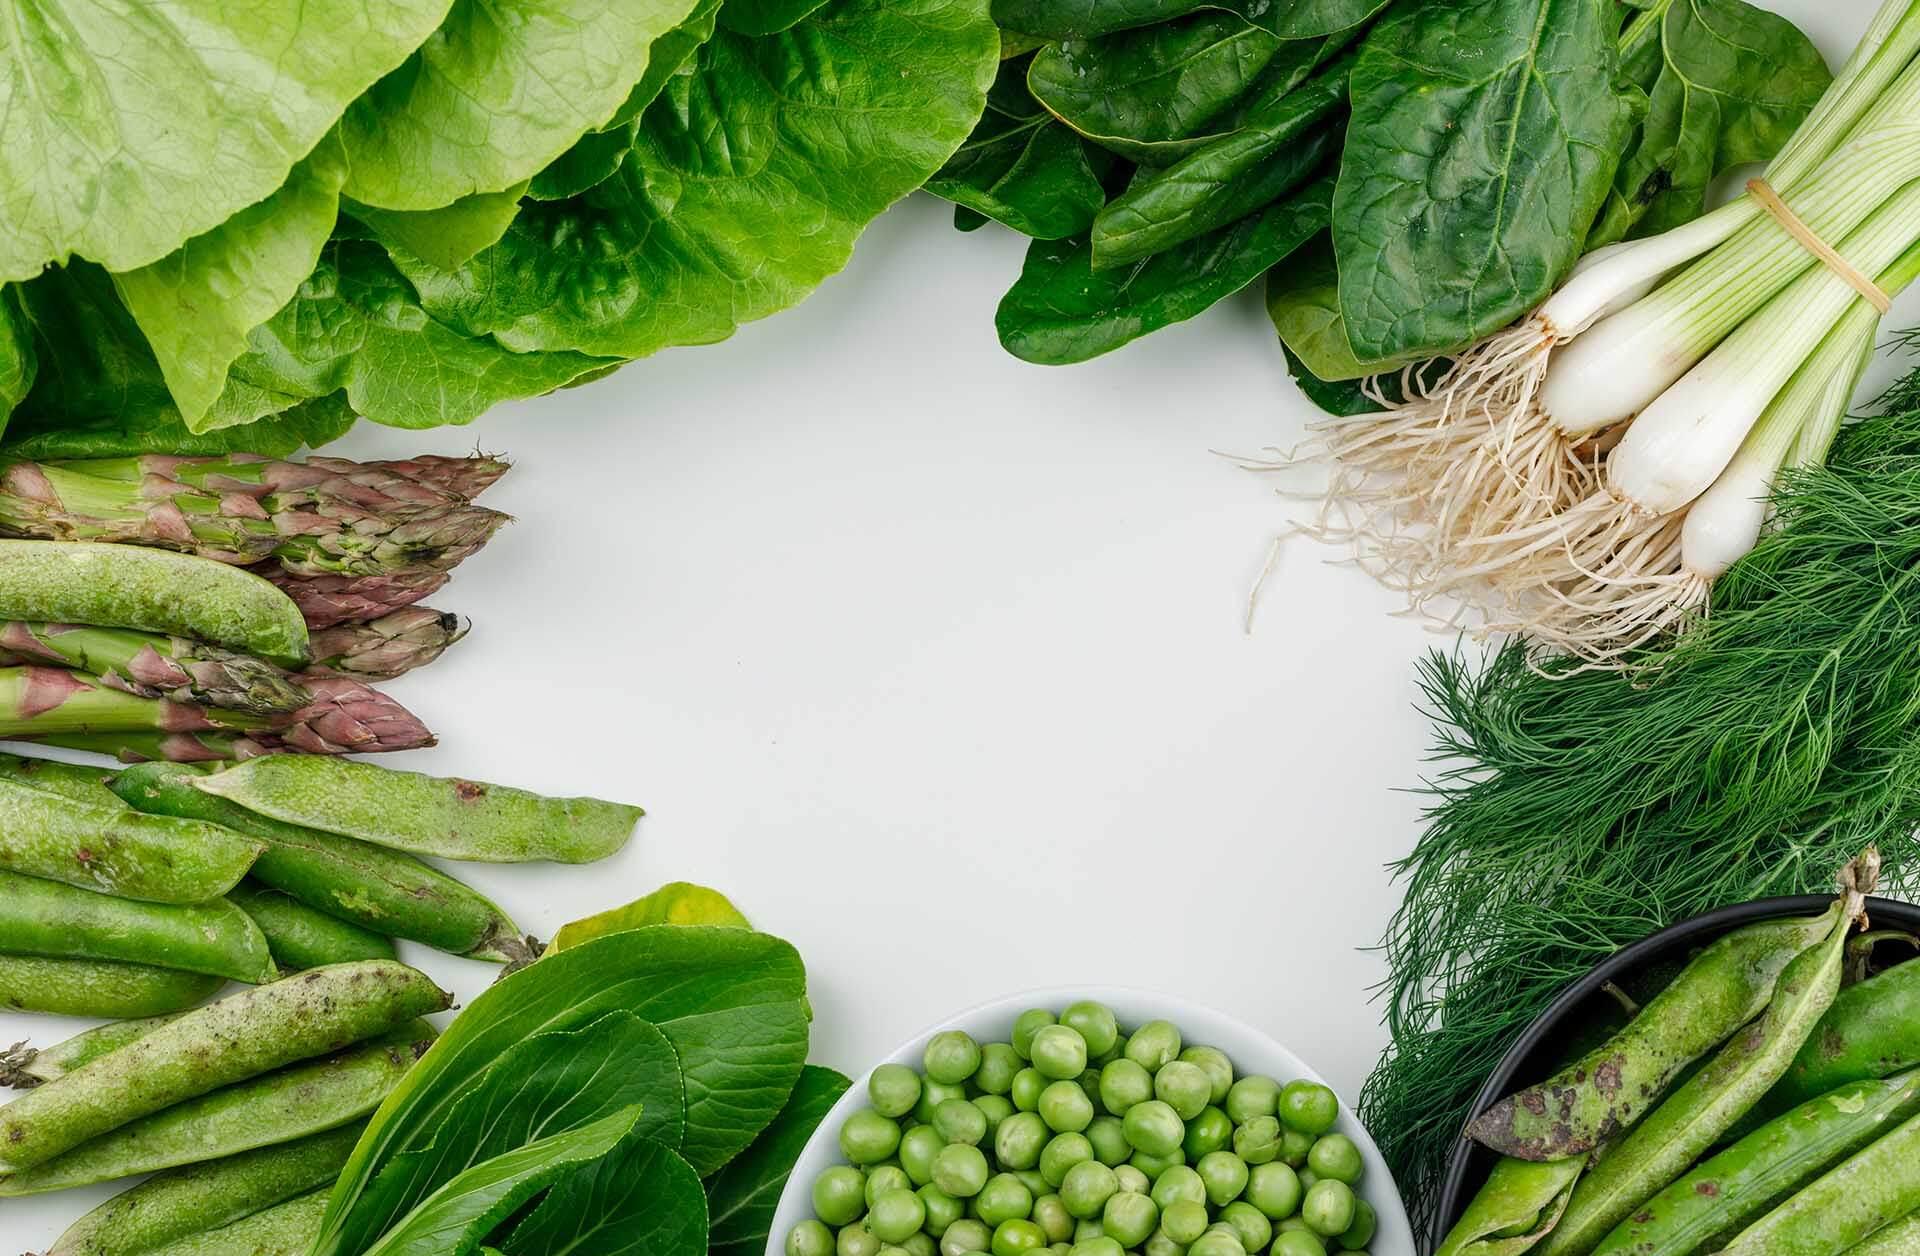 zeleno lisnato povrce, klub zdravih navika, kzn, zeleno lisnato povrce klub zdravih navika, zeleno lisnato povrce kzn, zelenis, jesenje povrce, vecera, vitamini, saveti, Iceberg Salat Centar